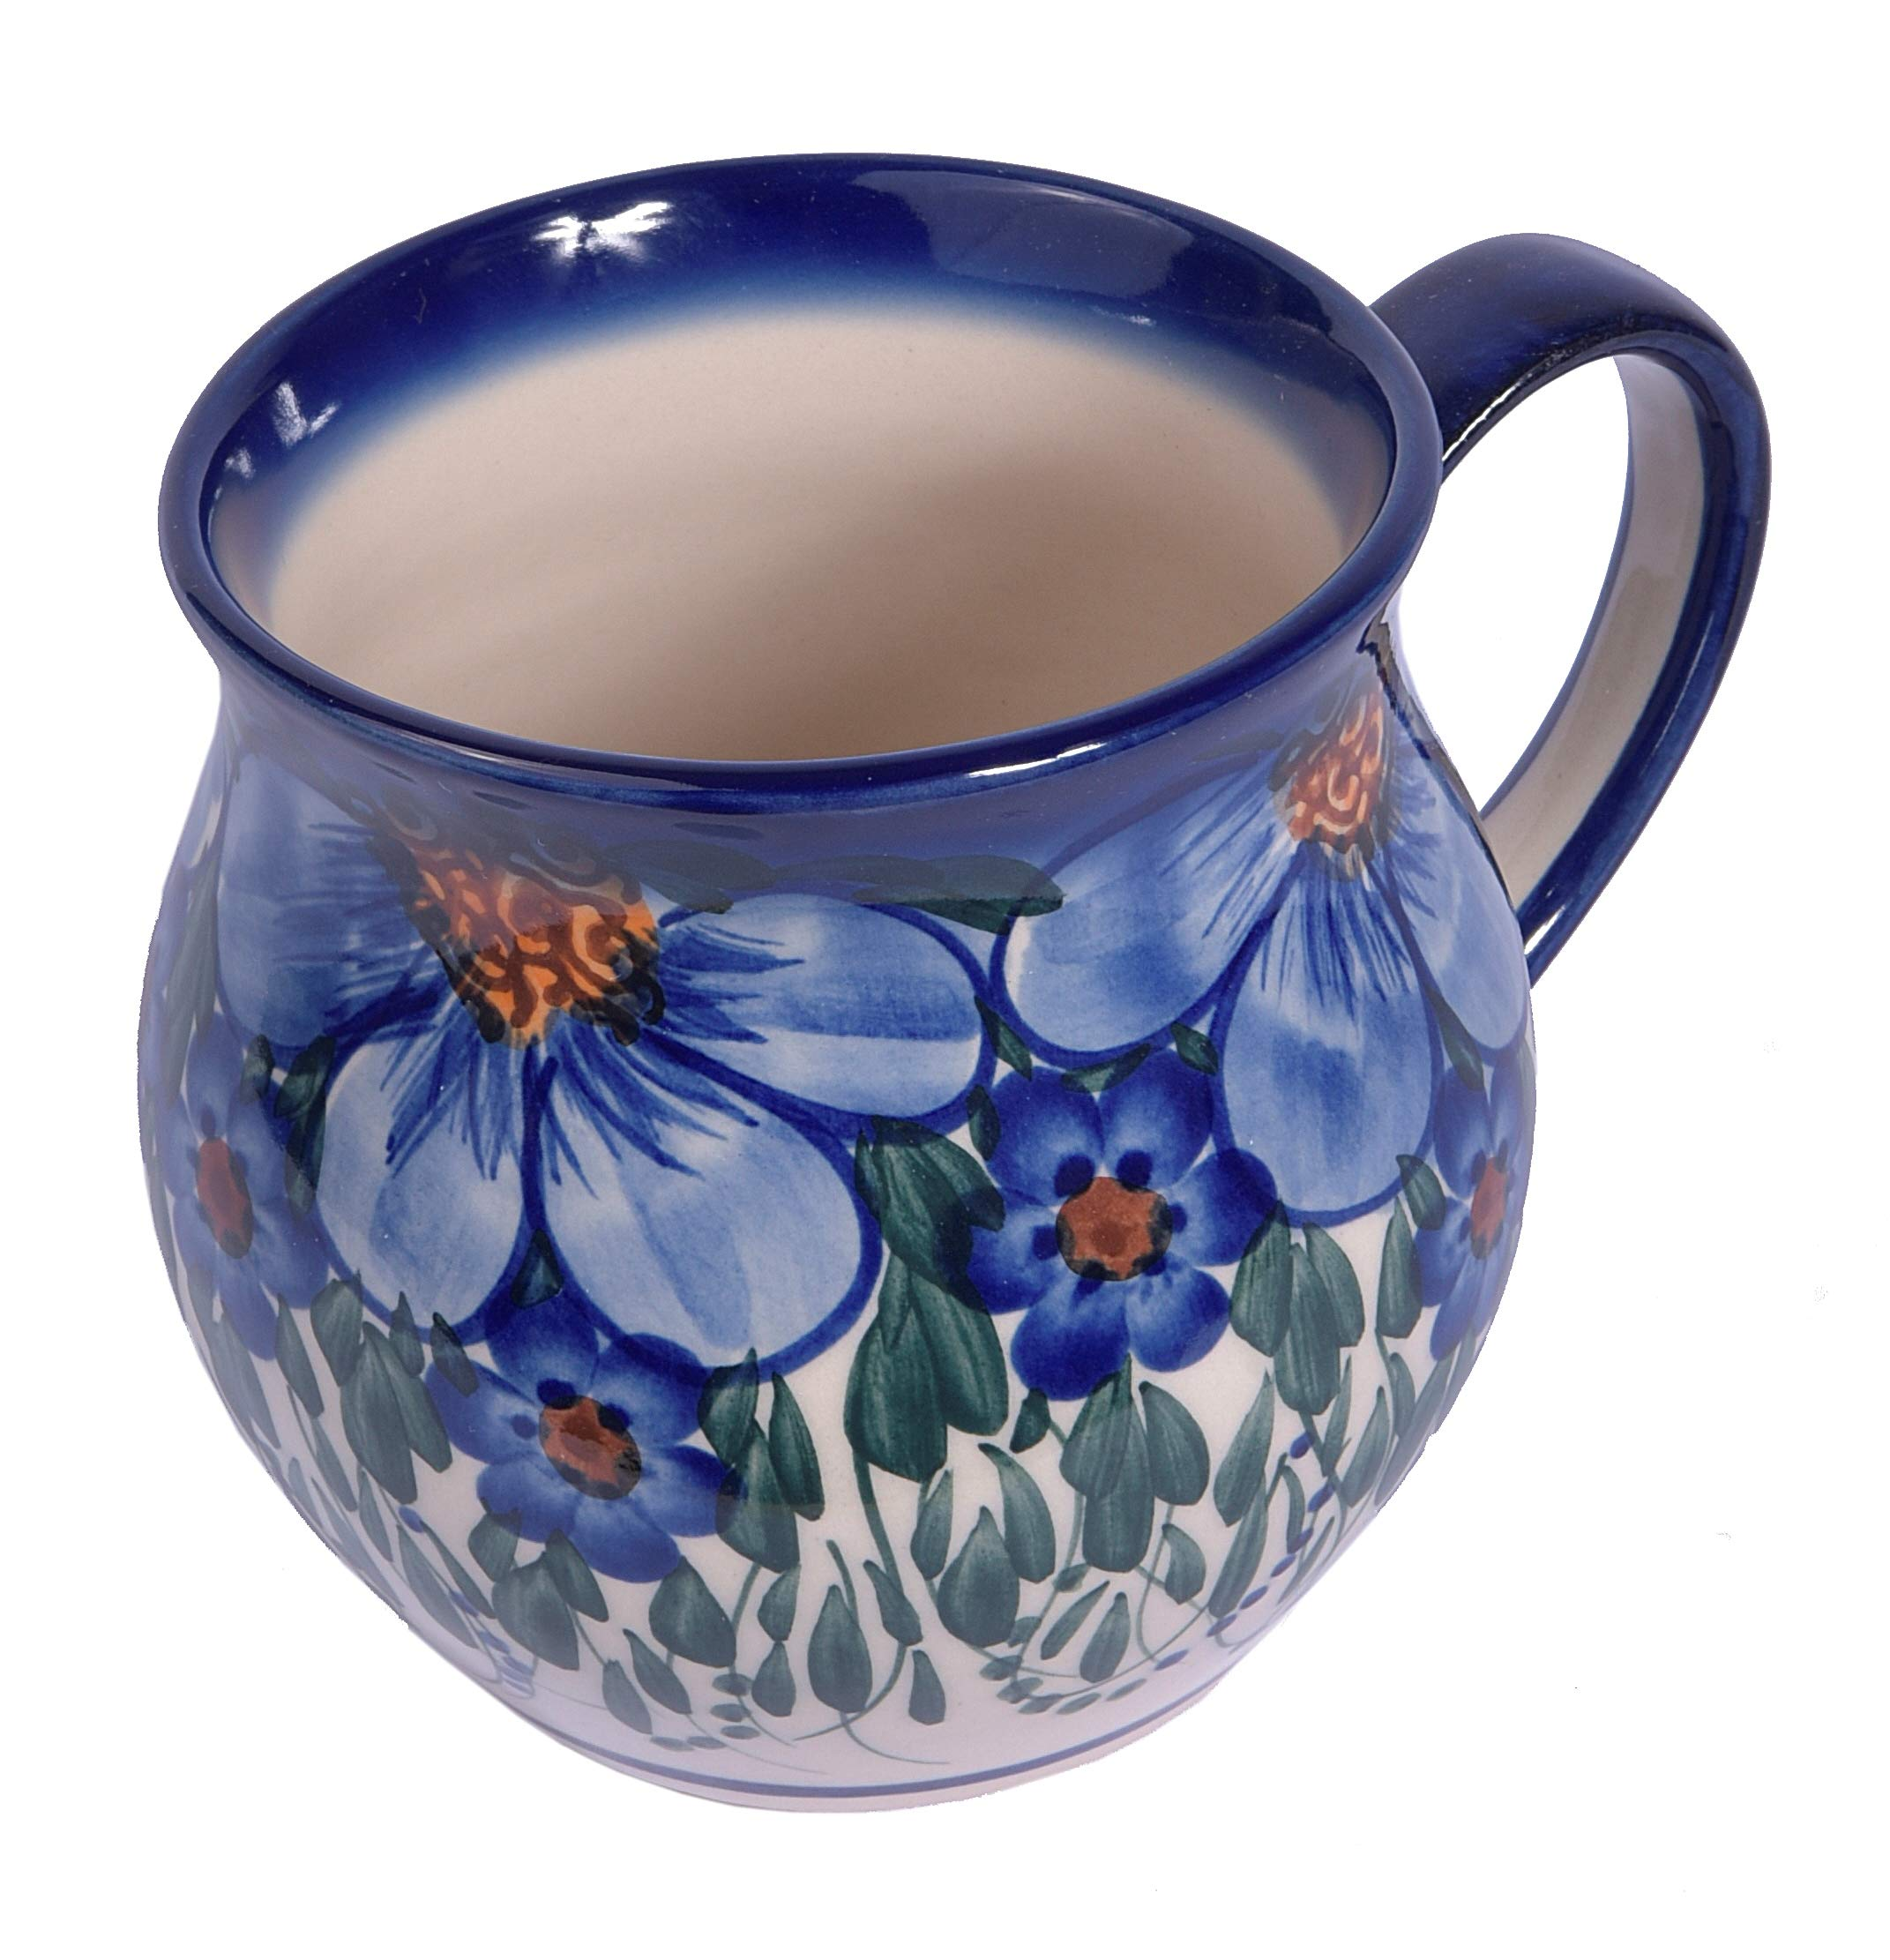 Traditional Polish Pottery, Handcrafted Ceramic Bubble Mug, Boleslawiec Style Pattern, Q.502.CREDO